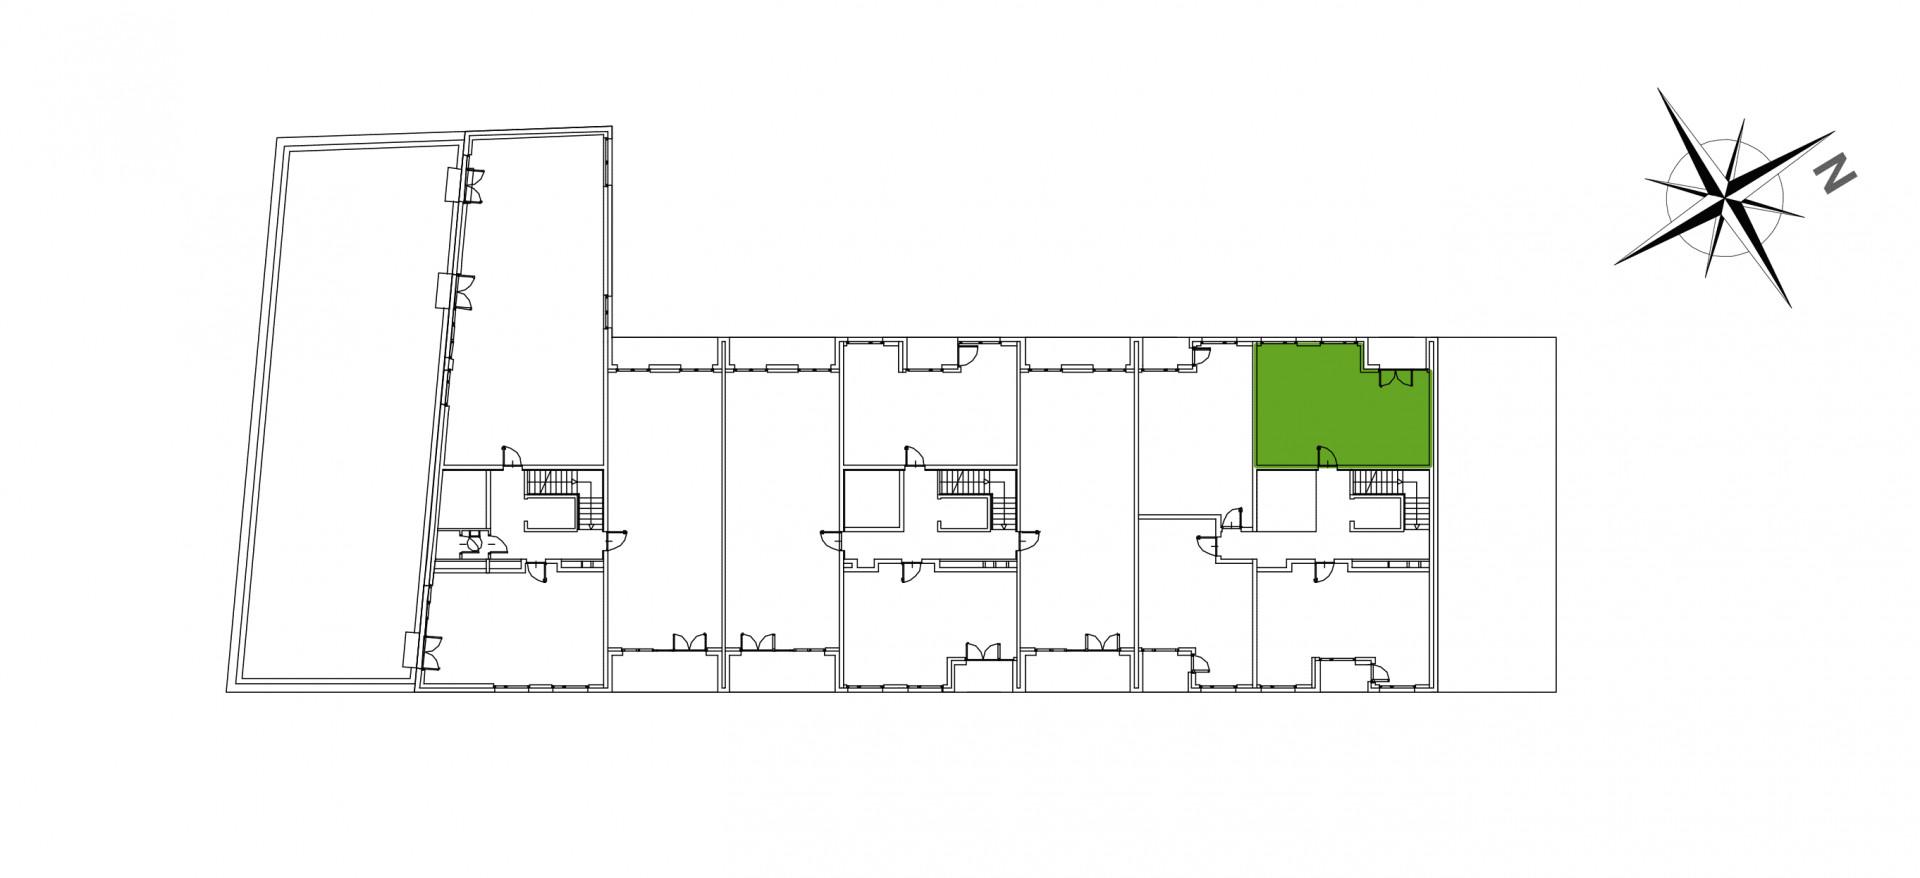 Mazowiecka 72 / apartament nr 22 rzut 2